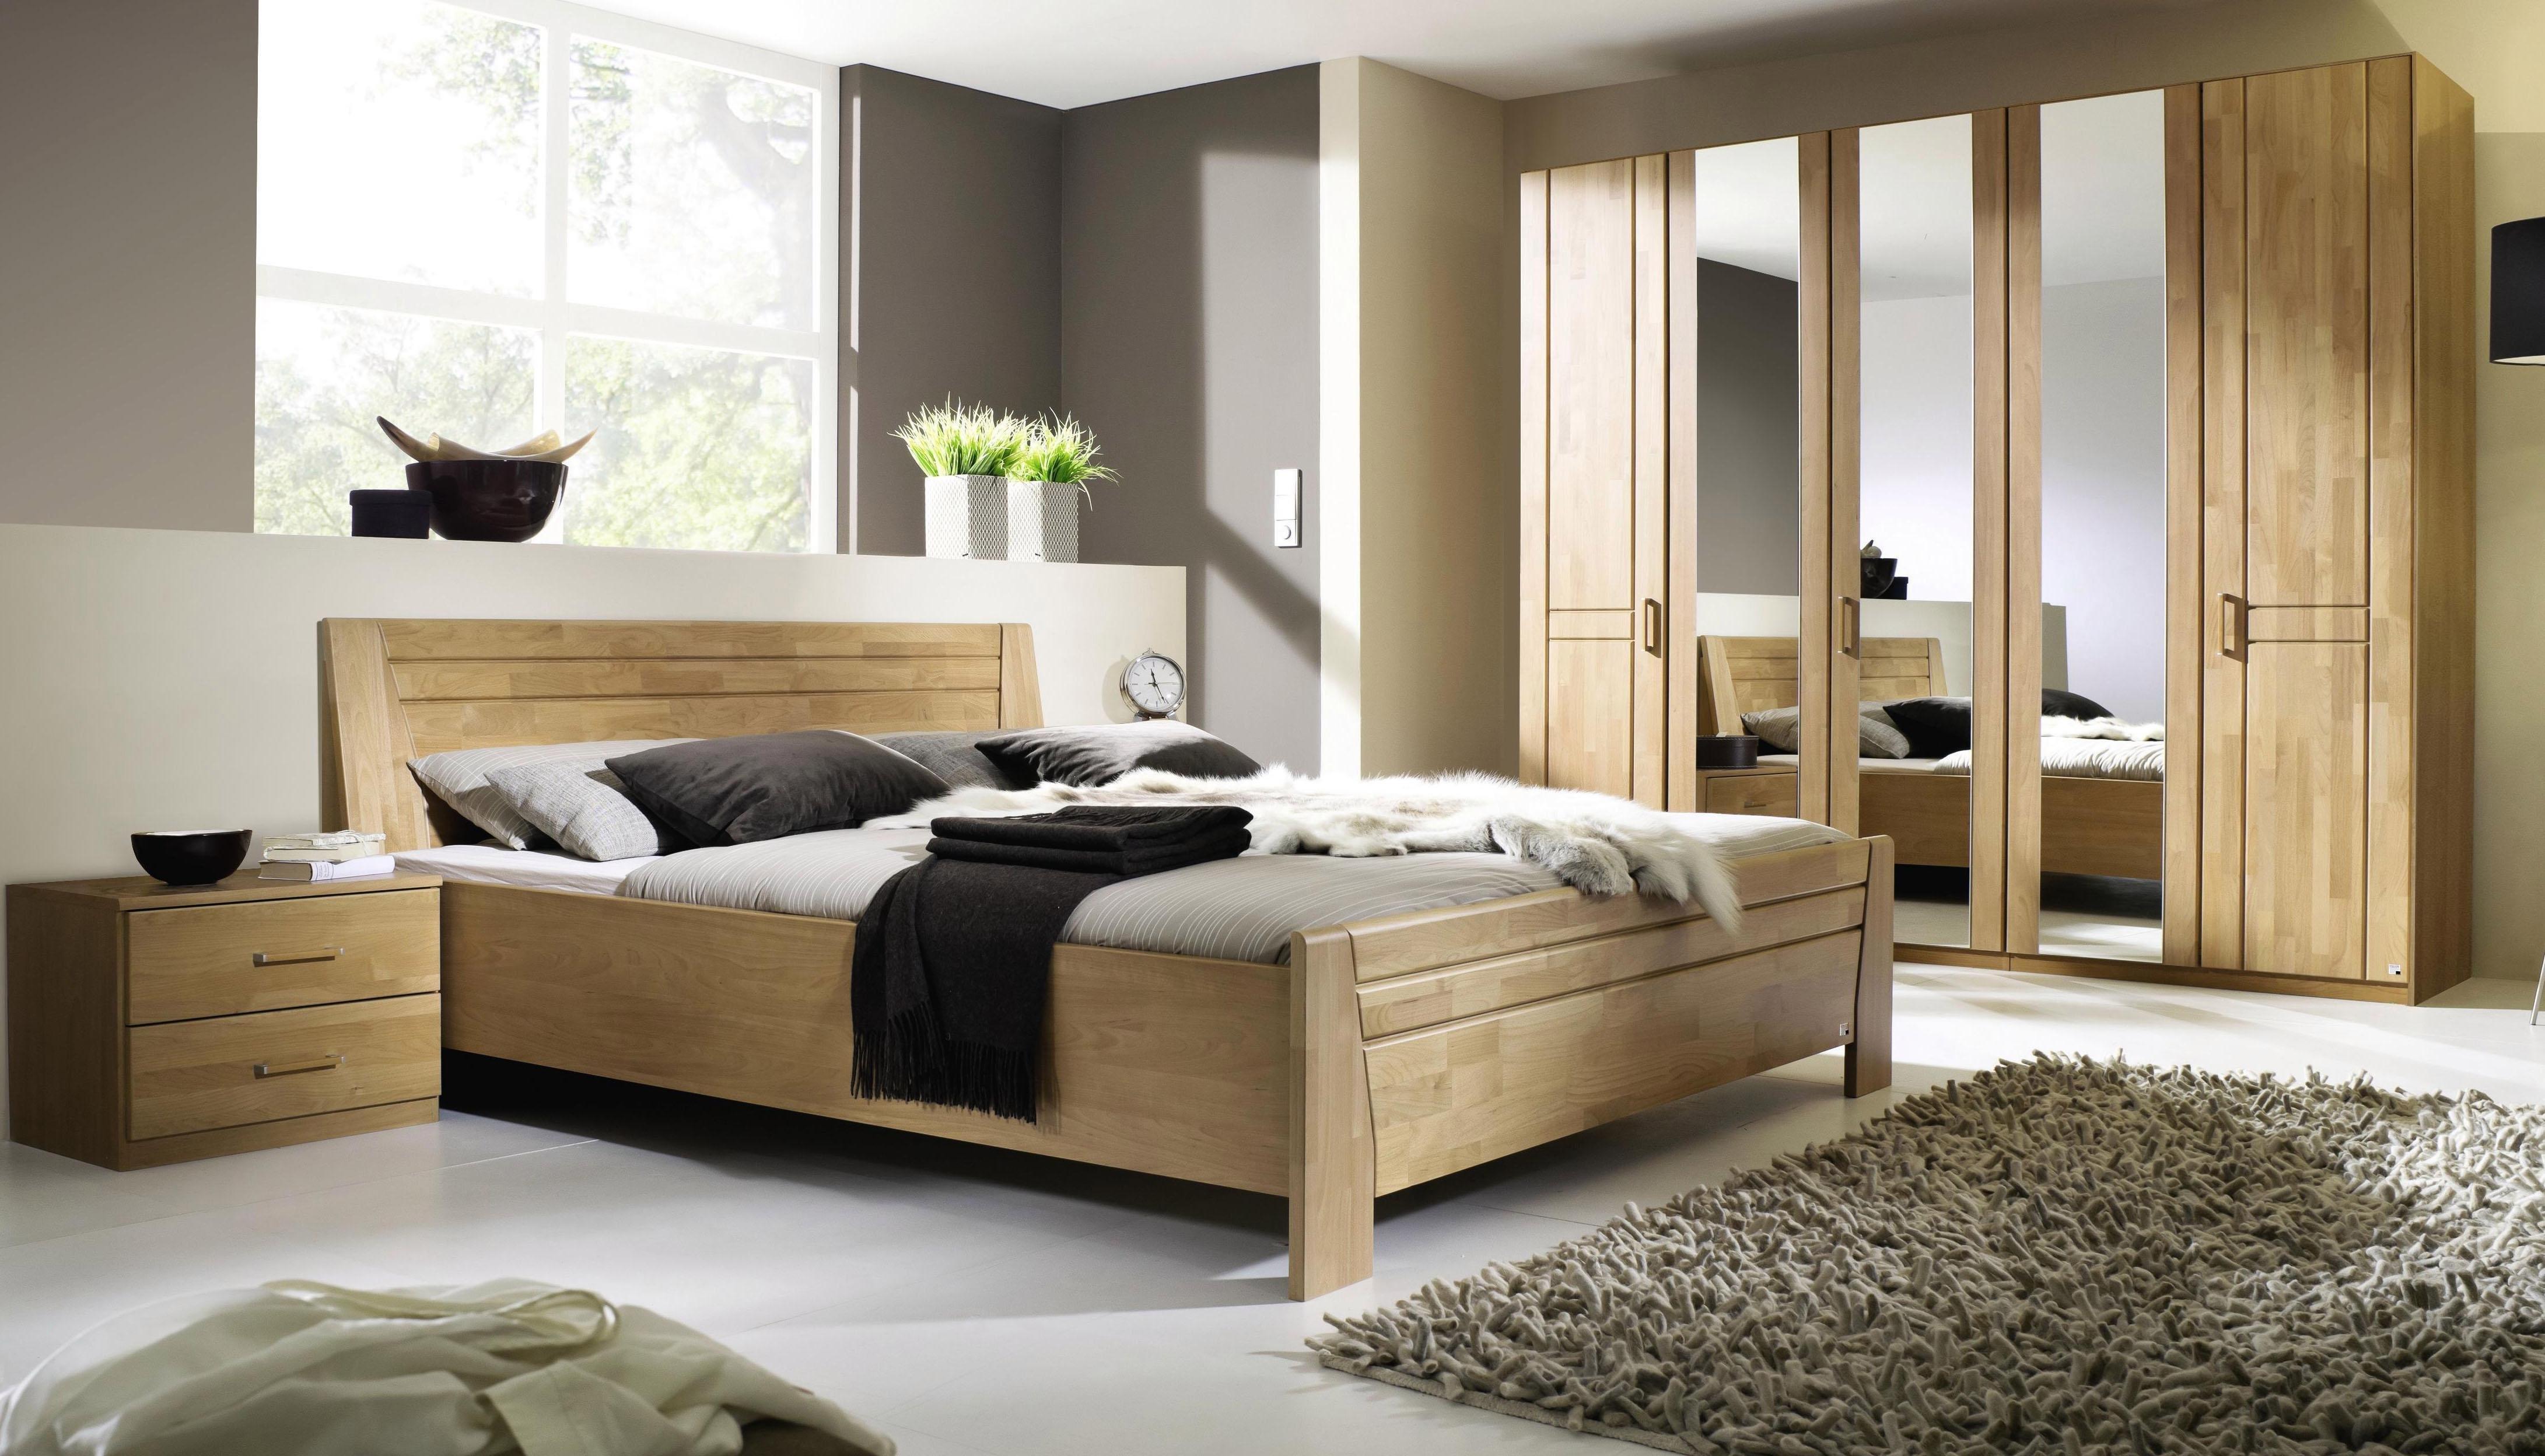 https://i.otto.nl/i/otto/26695495/slaapkamermeubelen-in-4-delige-set-beige.jpg?$ovnl_seo_index$